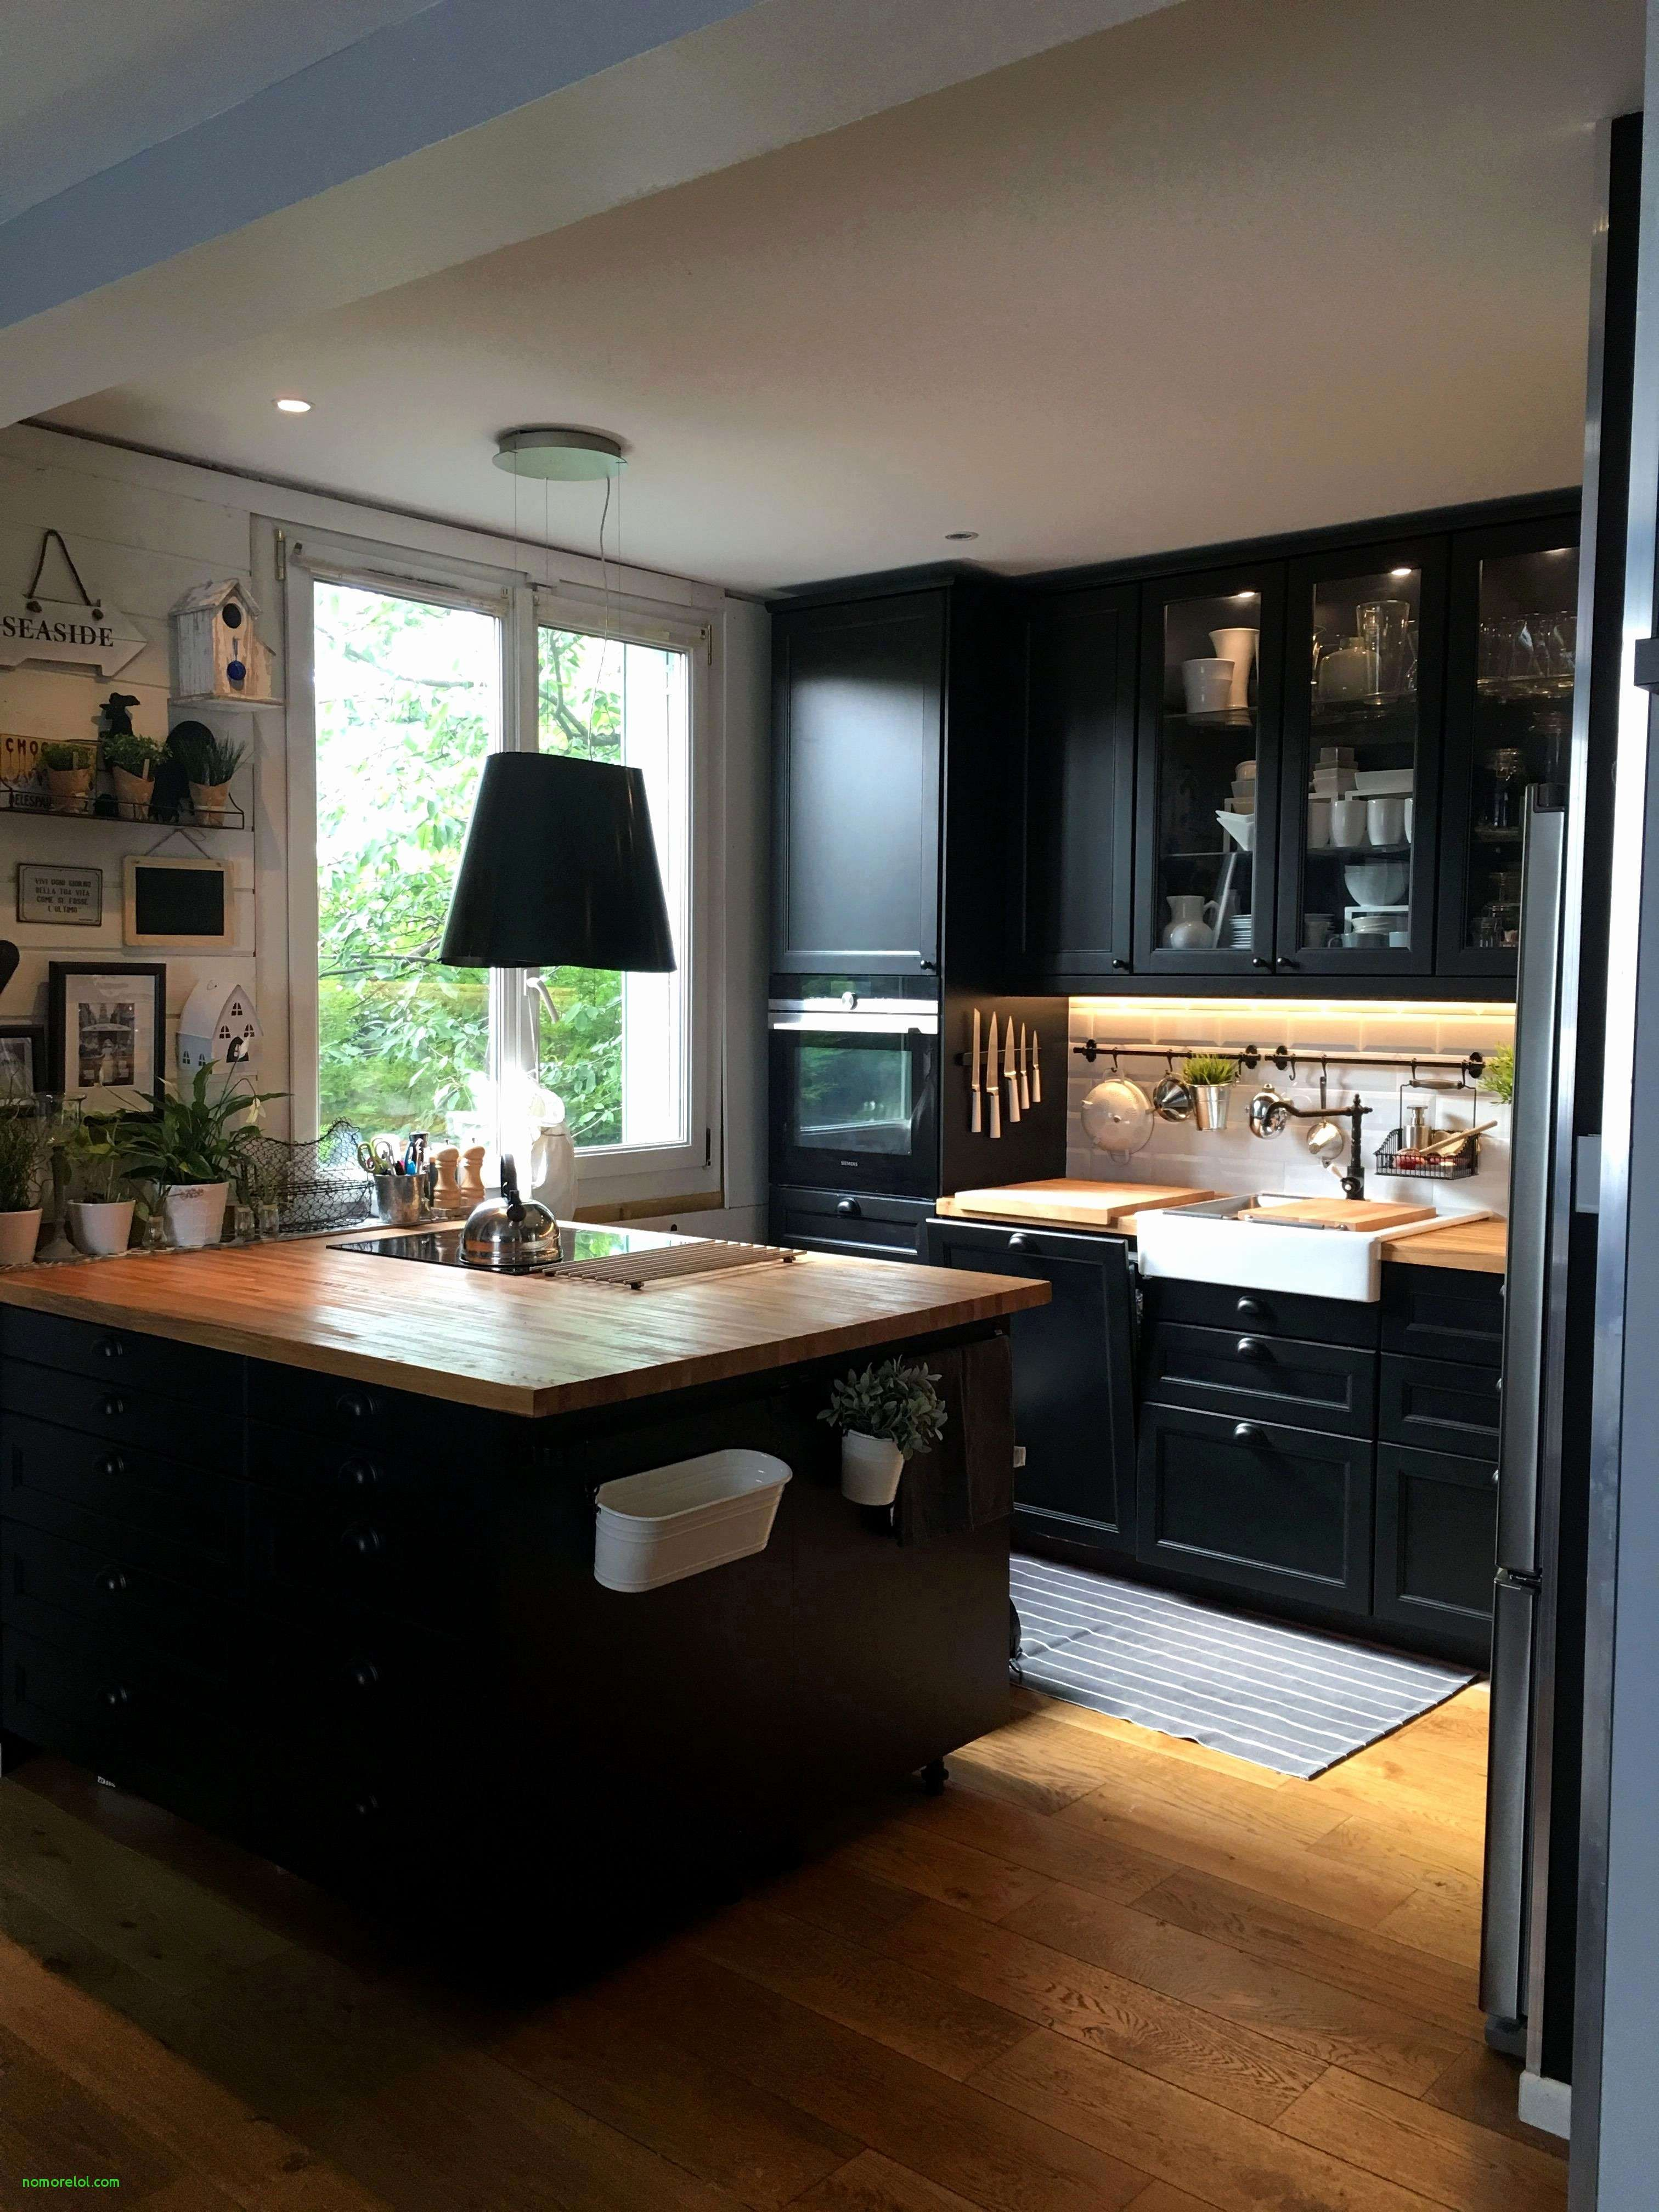 Sleek Kitchen Inspiration June 2018 Home Decor Kitchen Interior Design Kitchen Kitchen Design